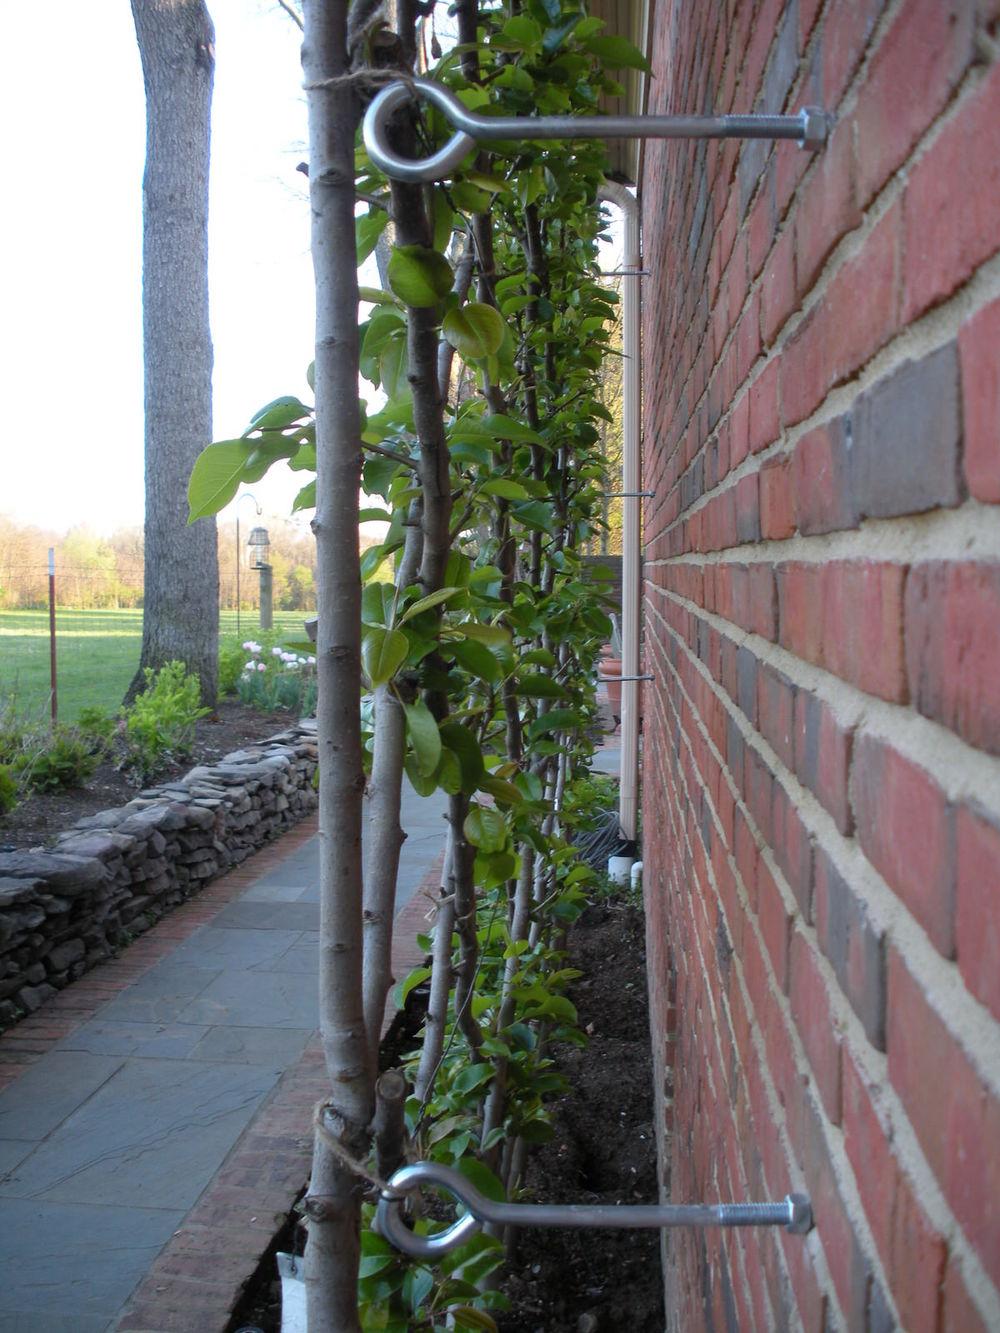 Justin Stelter Landscape Gardening - Espalier Installations - 3774835529_eb9b86da6f_o.jpg